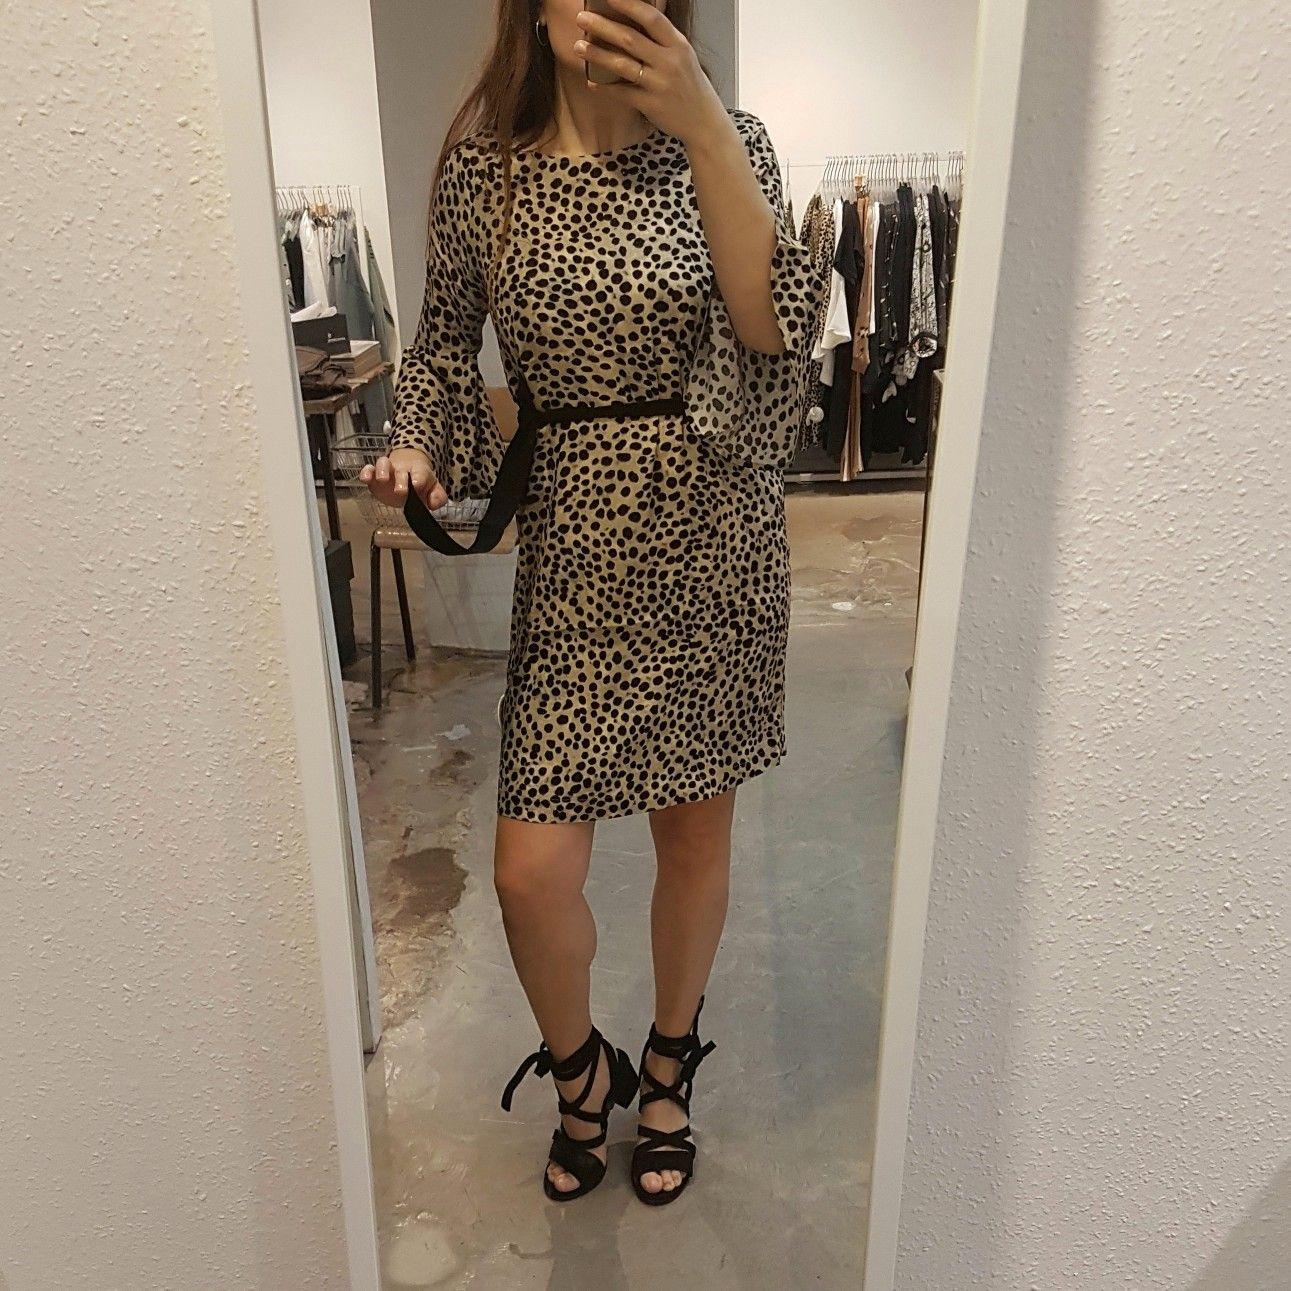 Yaya Leopard Printed Woven Dress Via Vai Kirsten Elle Sandalen